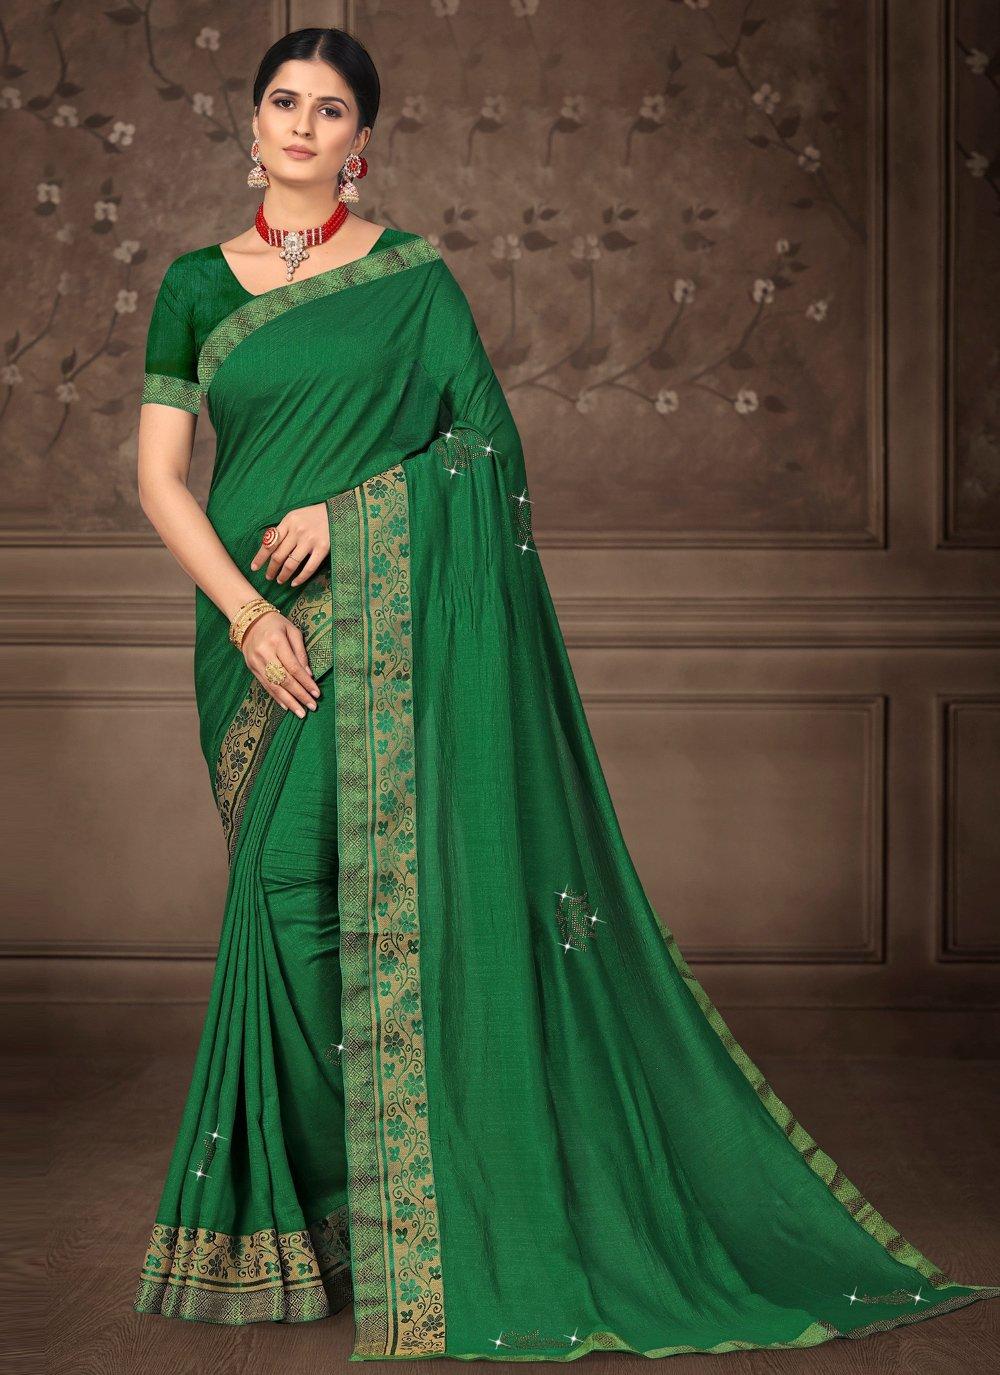 Green Festival Bollywood Saree